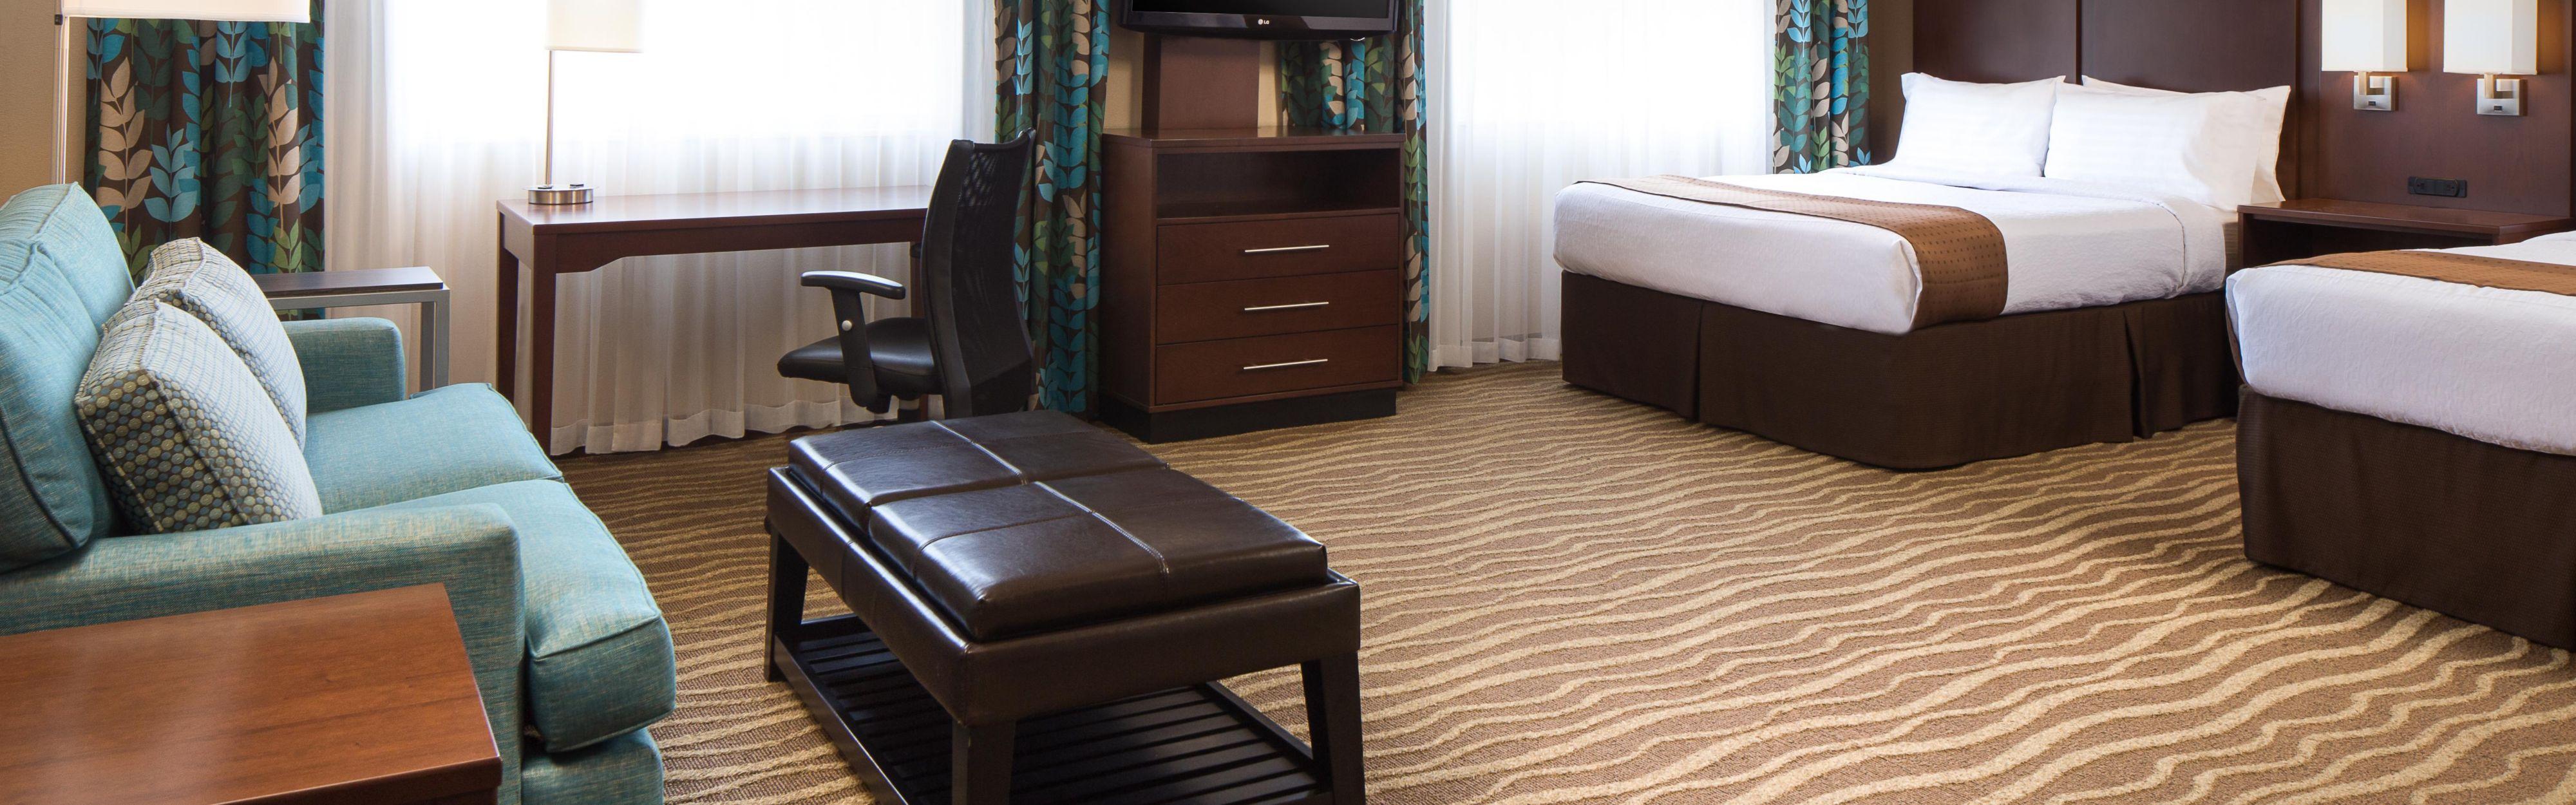 Overland Park, KS Hotel   Holiday Inn Hotel U0026 Suites Overland Park